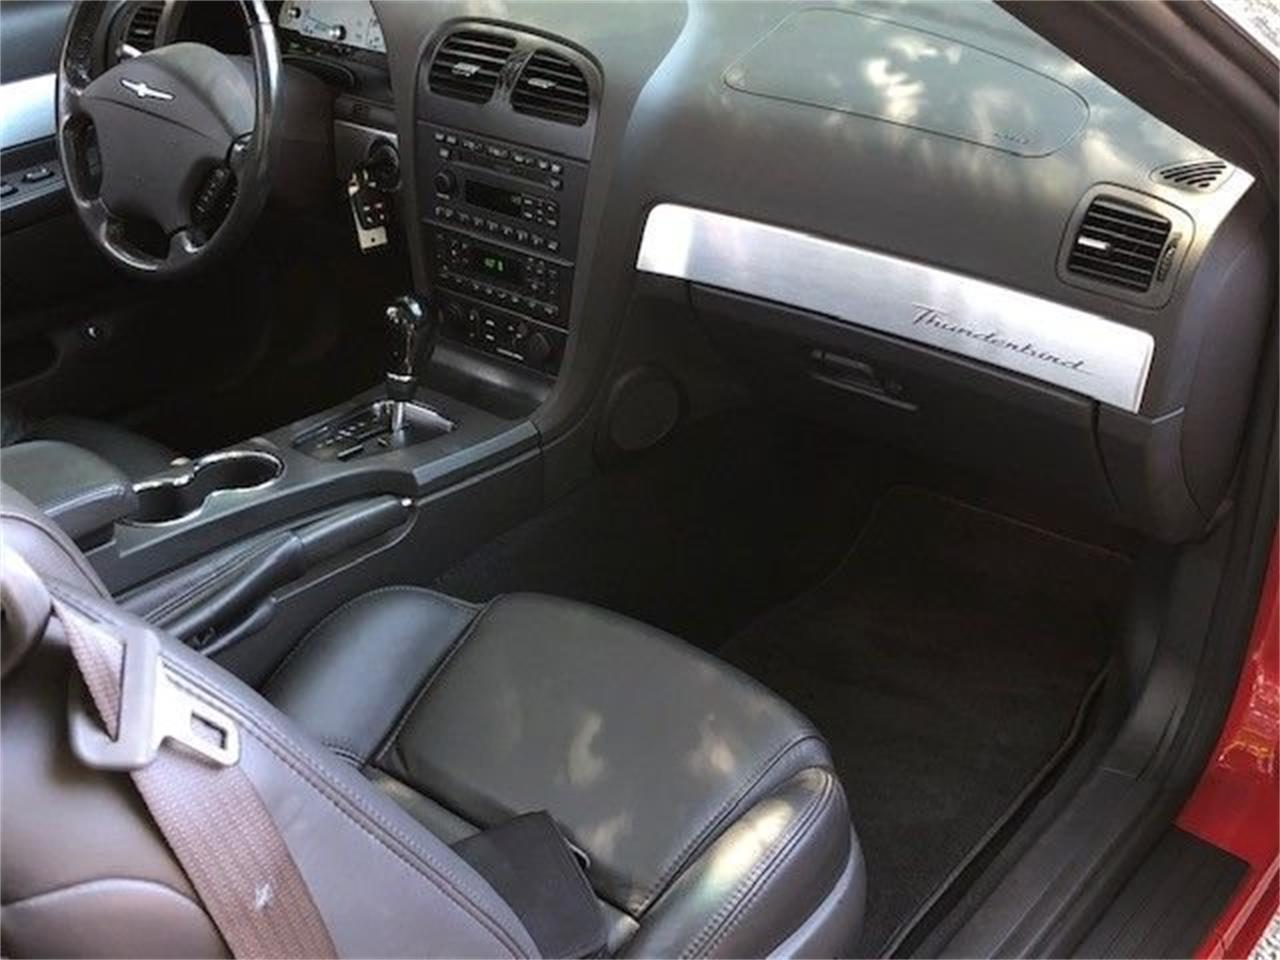 2002 Ford Thunderbird (CC-1272648) for sale in Greensboro, North Carolina